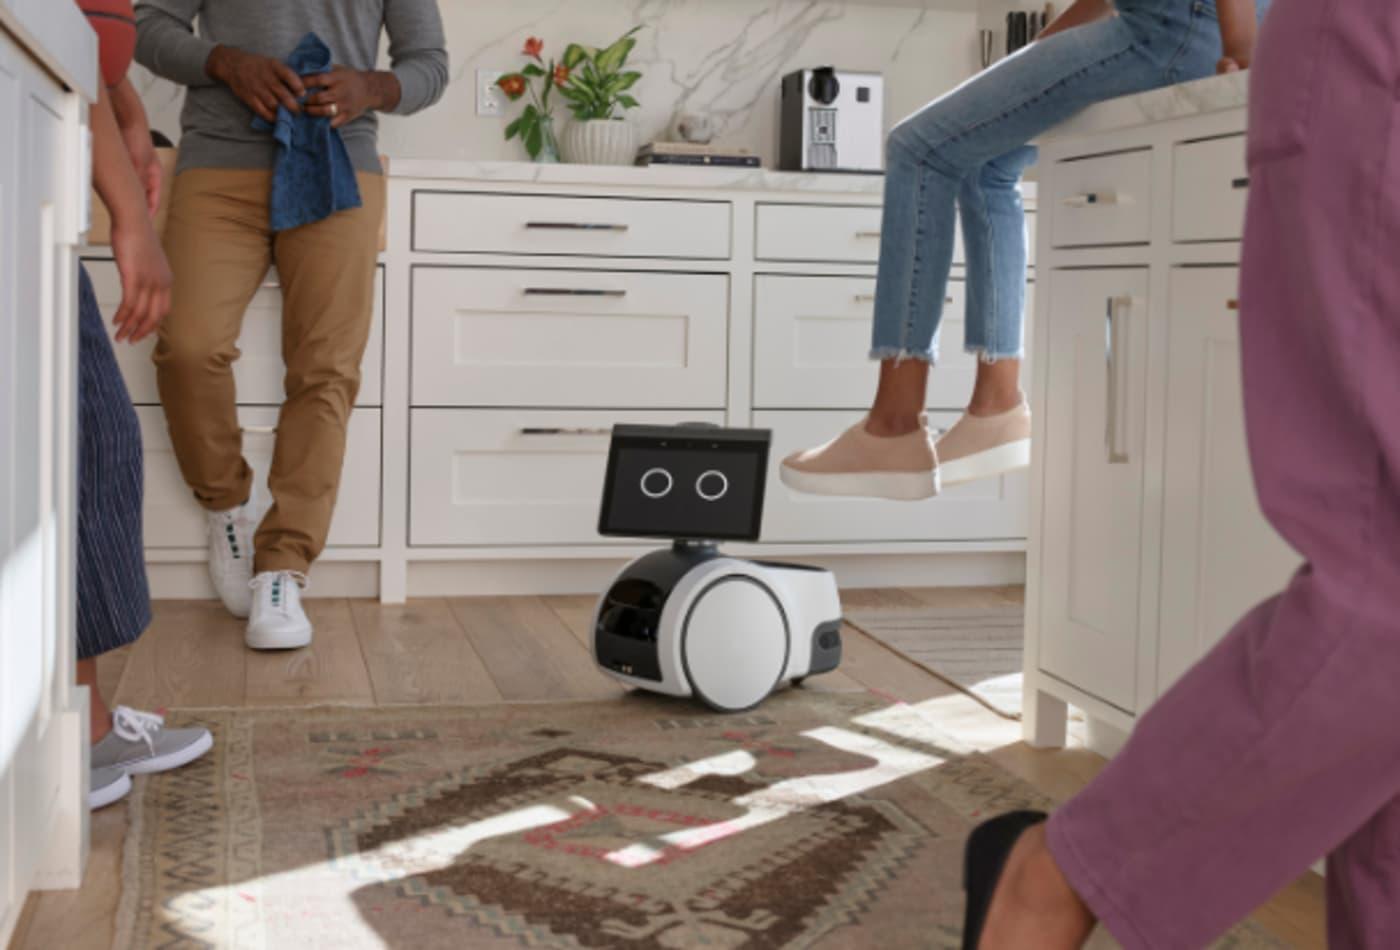 Amazon announces Astro home robot that roams around your house